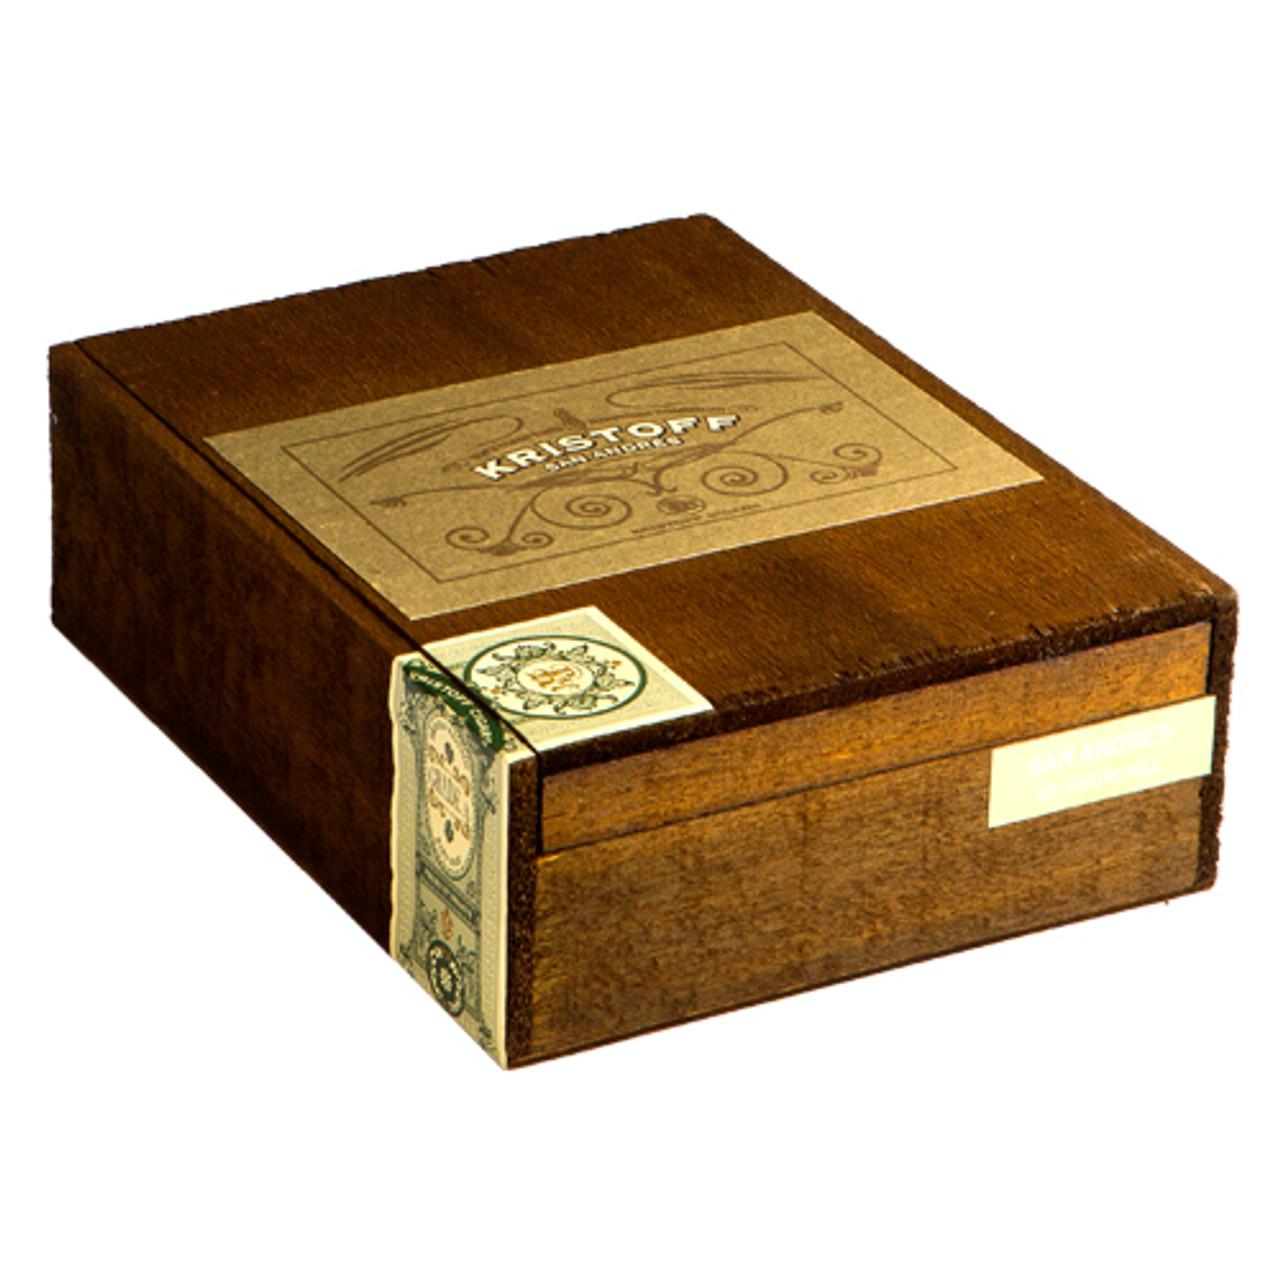 Kristoff San Andres 660 Cigars - 6 x 60 (Box of 20)